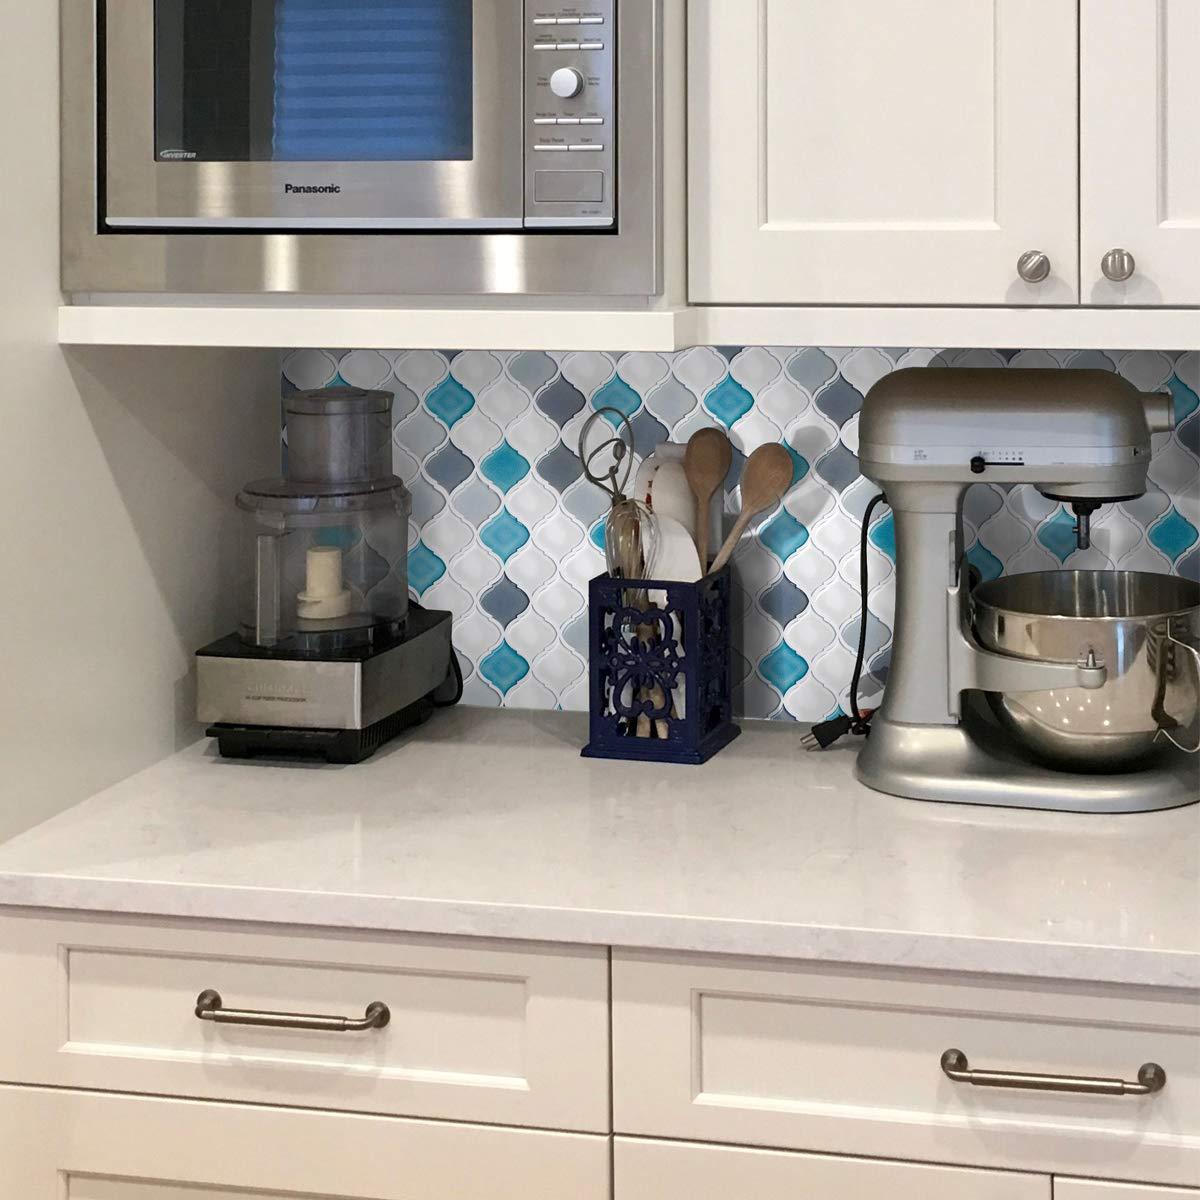 Peel and Stick Wall Tile for Kitchen Backsplash-Slant Blue&White Arabesque Tile Backsplash-Kitchen Backsplash Tiles Peel and Stick Wall Stickers,6 Sheets by FAM STICKTILES (Image #6)